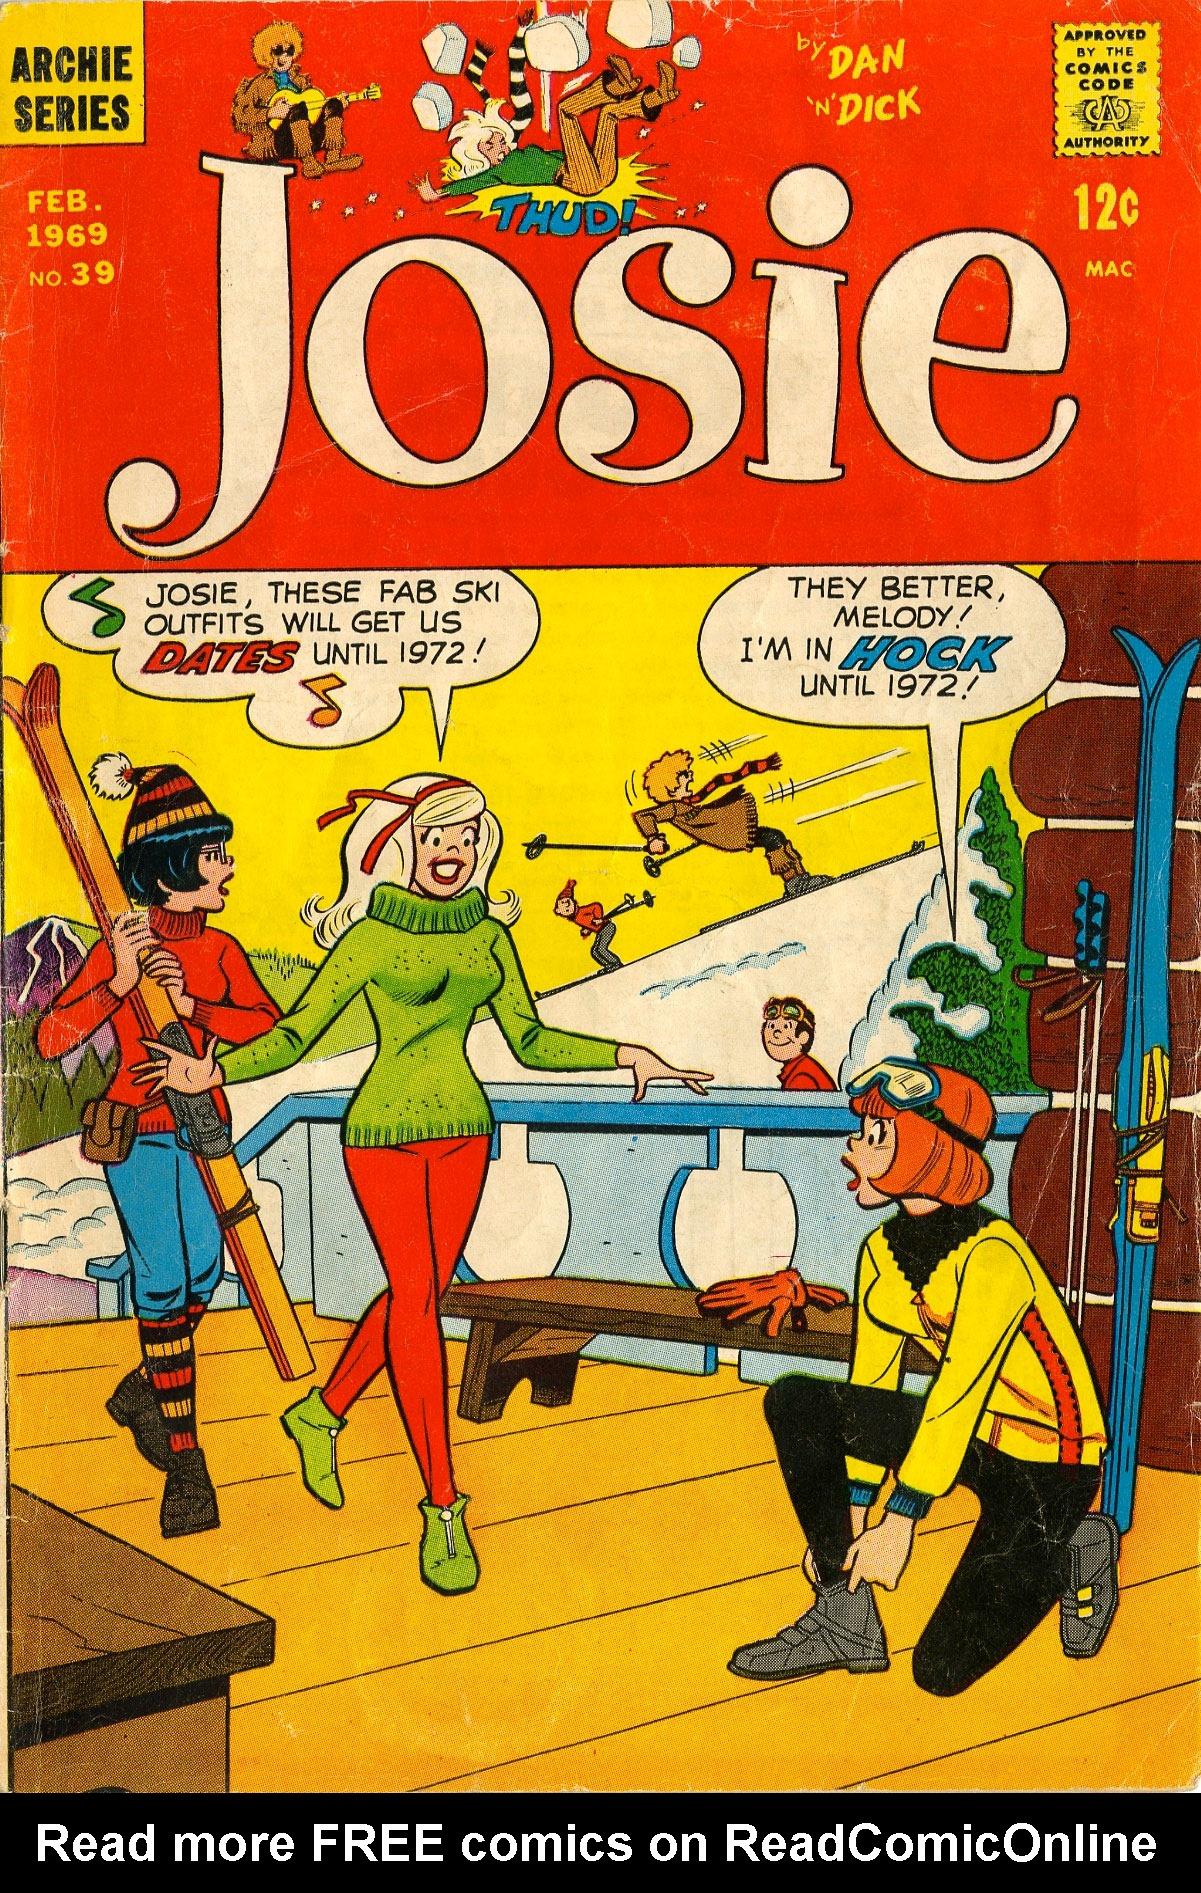 Read online She's Josie comic -  Issue #39 - 1